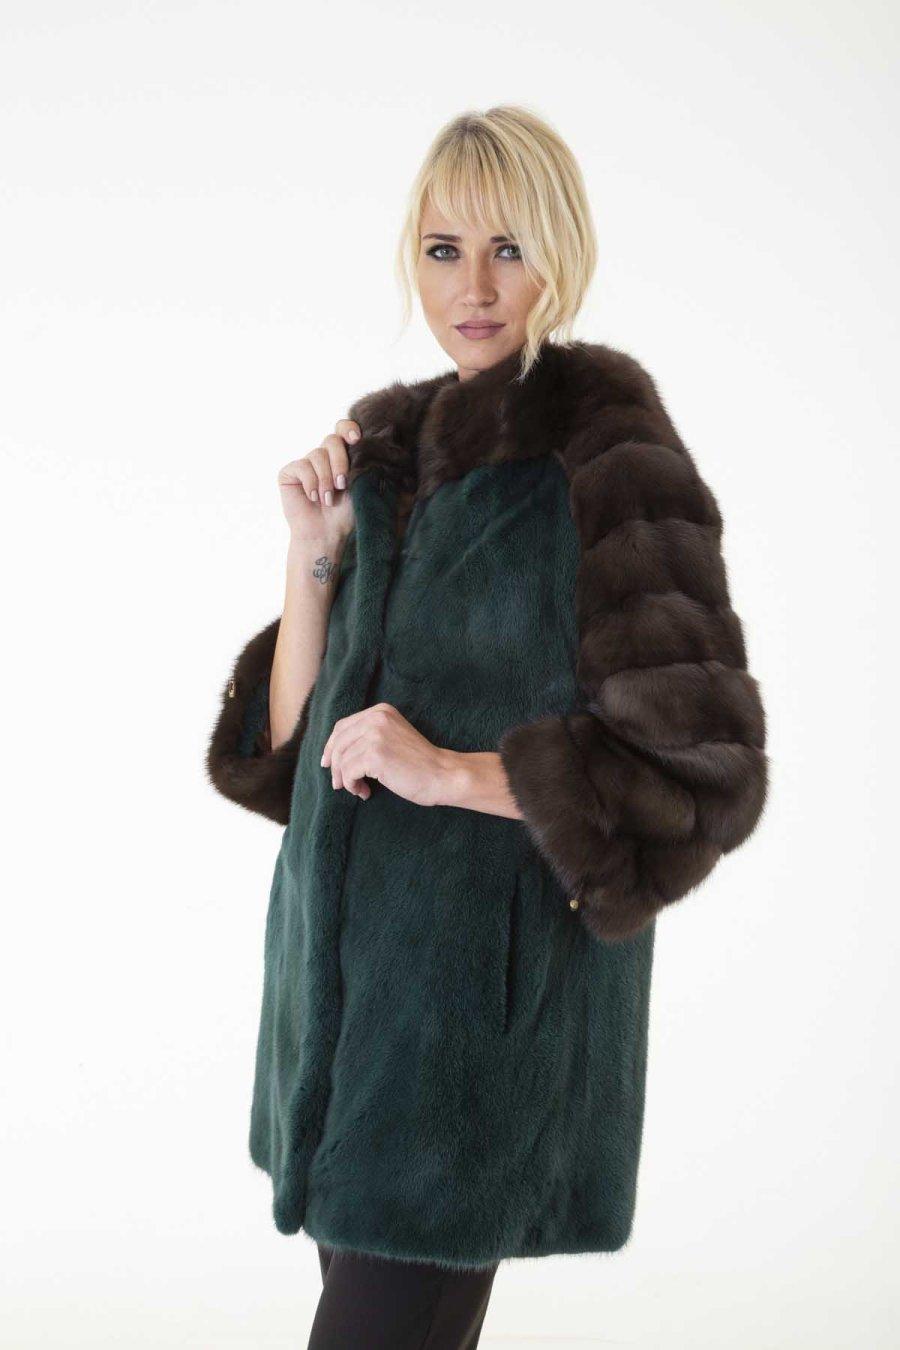 Shock Green Mink Fur Jacket | Пальто из меха норки цвета Shock Green - Sarigianni Furs